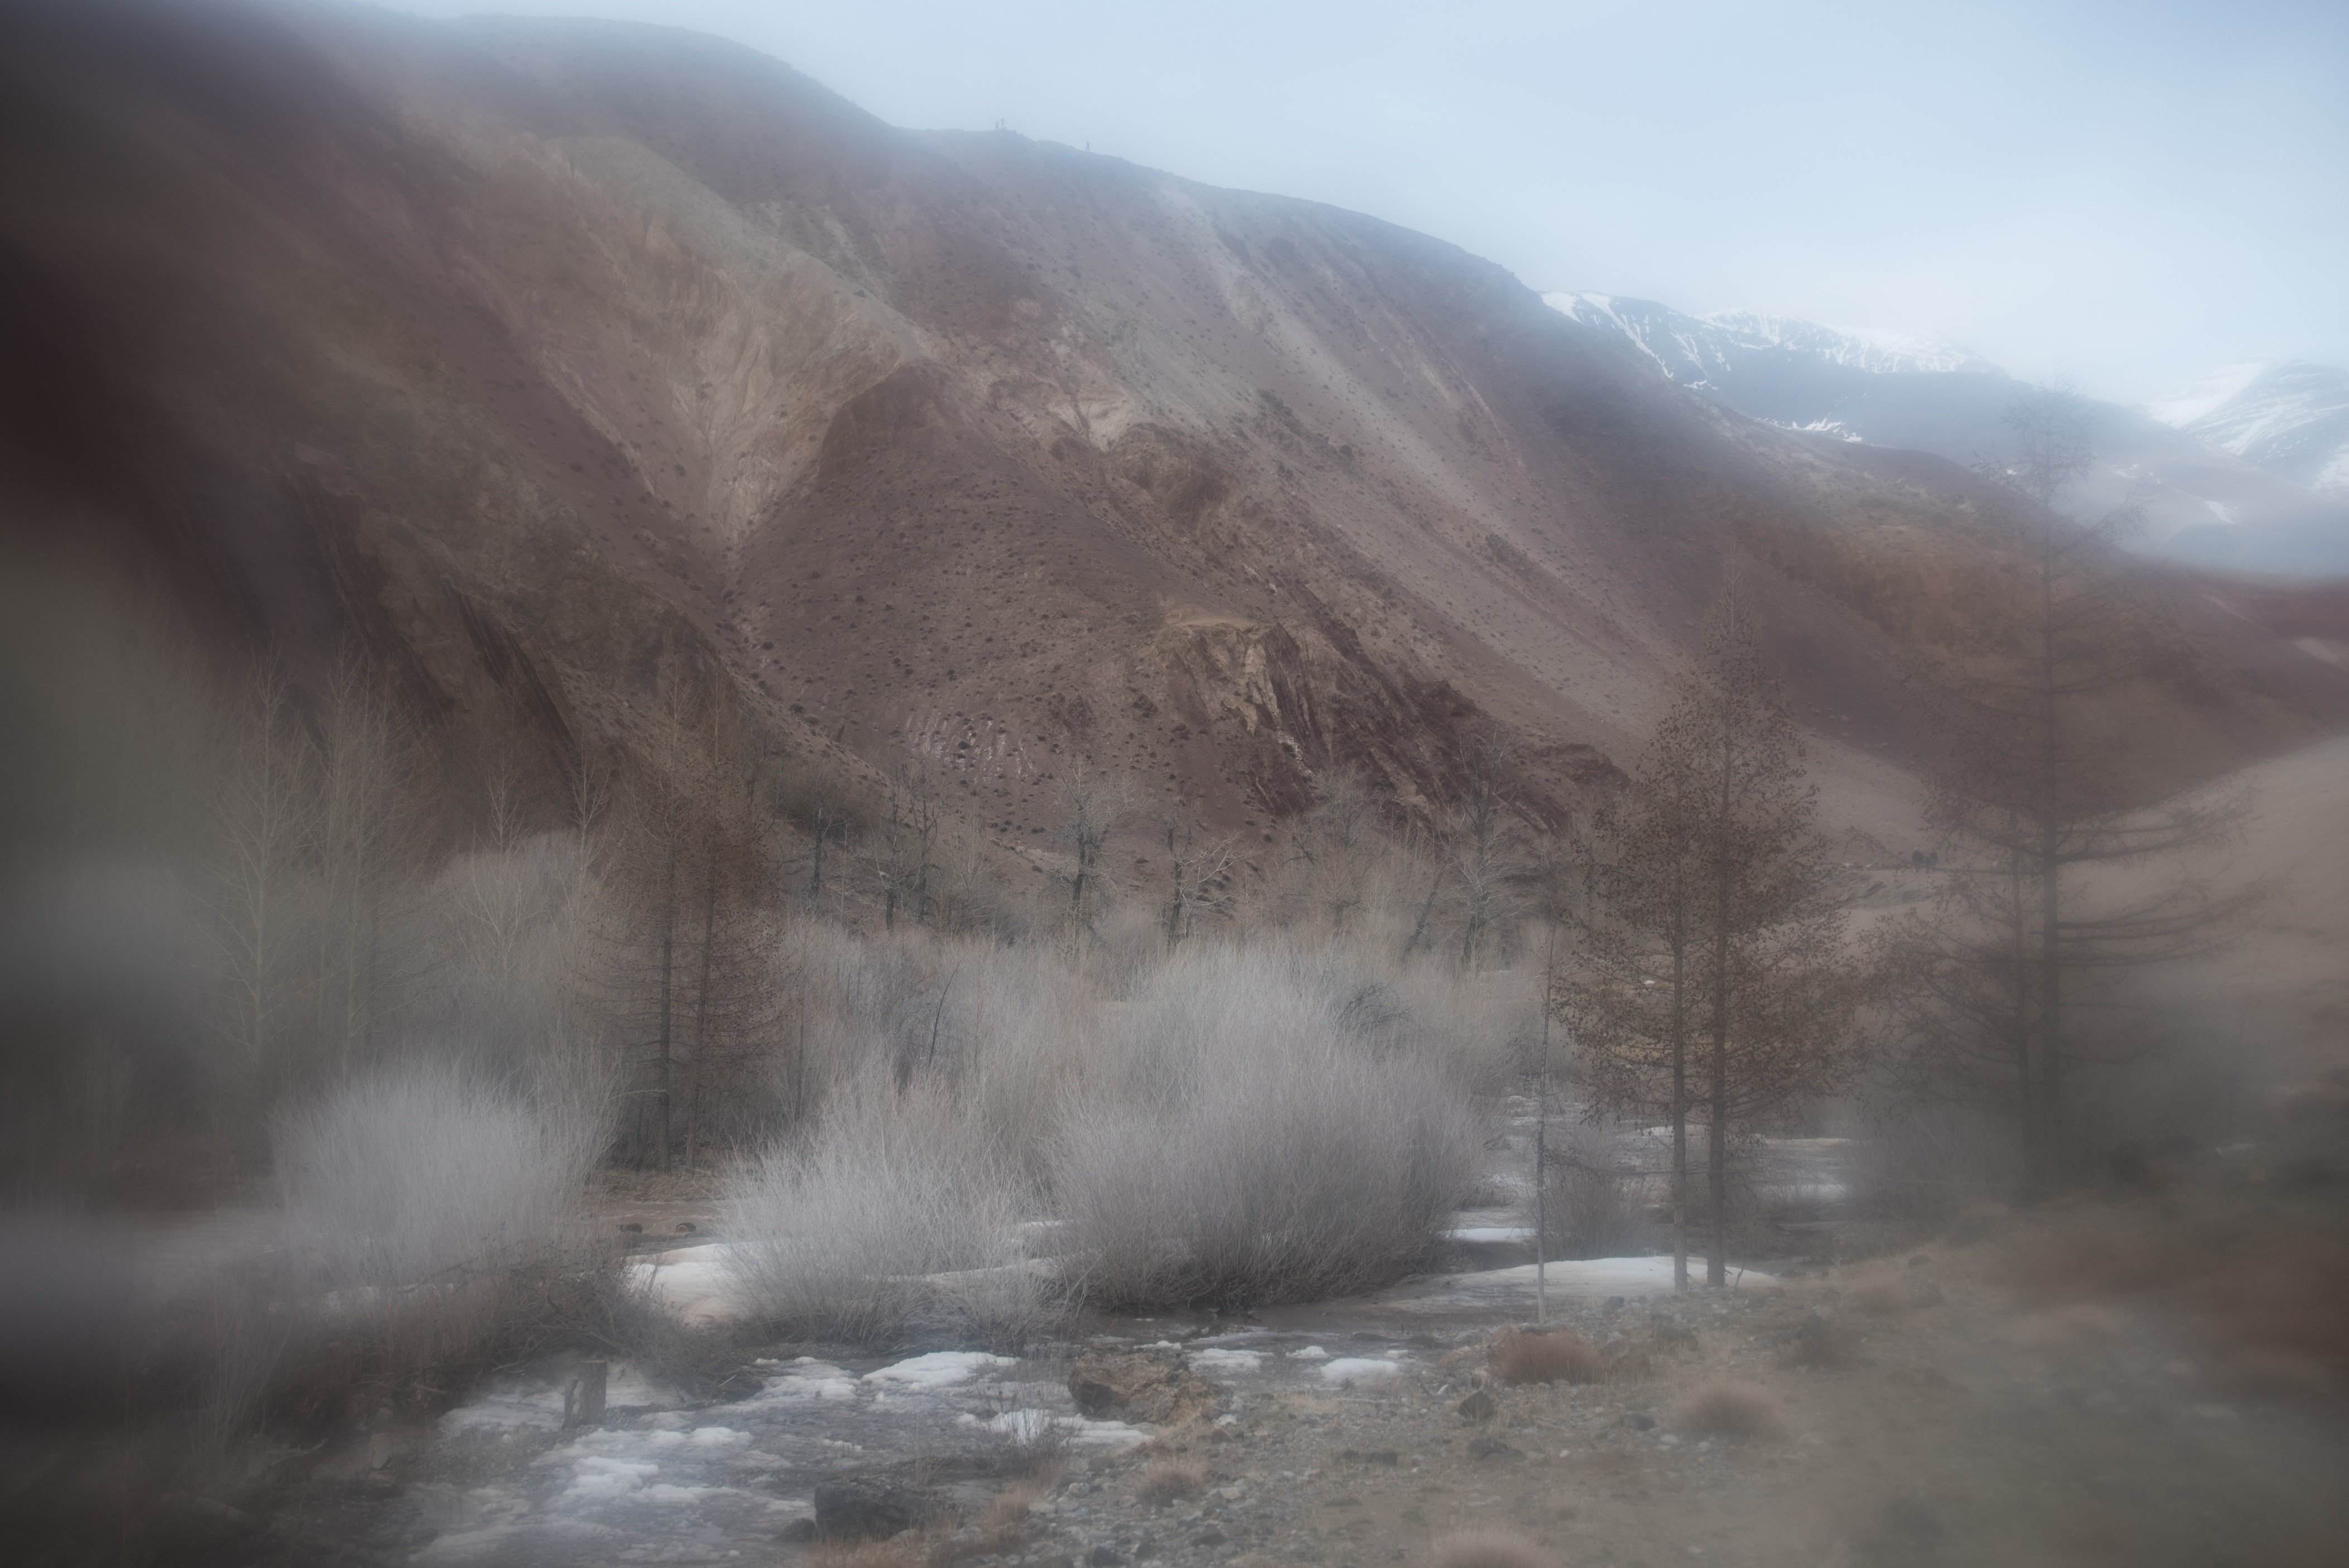 Алтай, река, landscape, mountains, Курлов Алексей